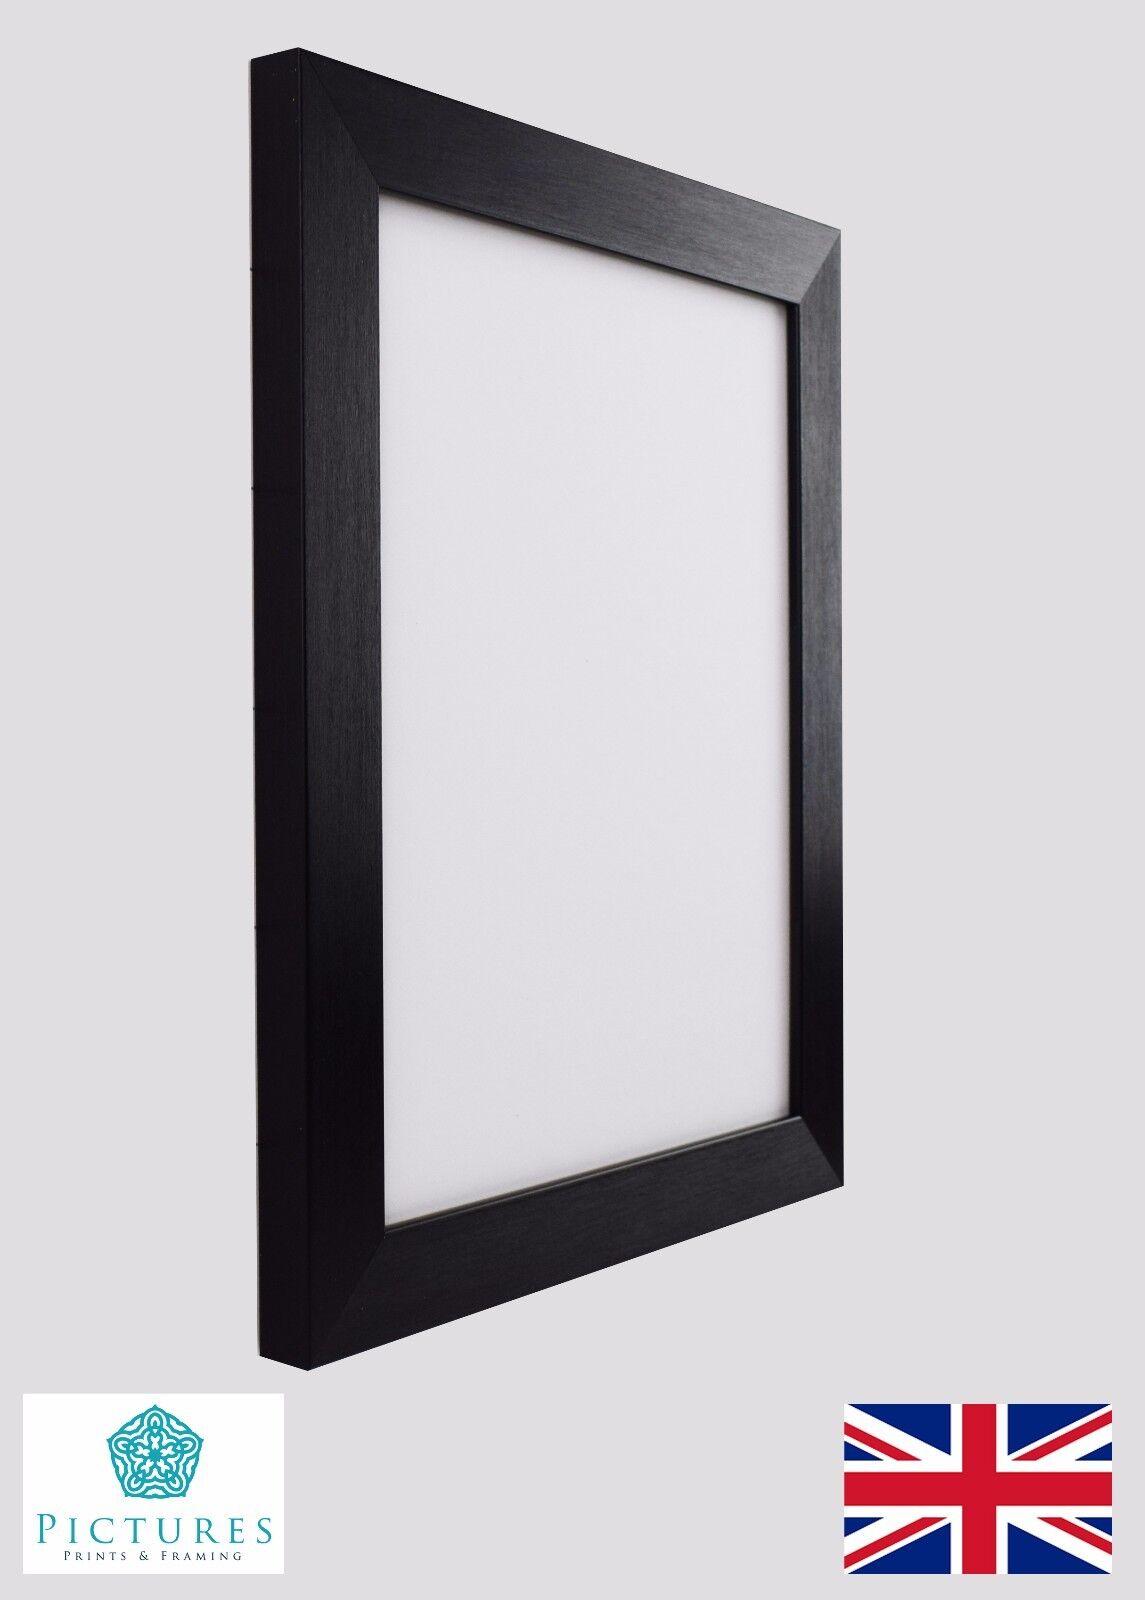 Noir Photo Poster Panoramique A1 Frames 13x13